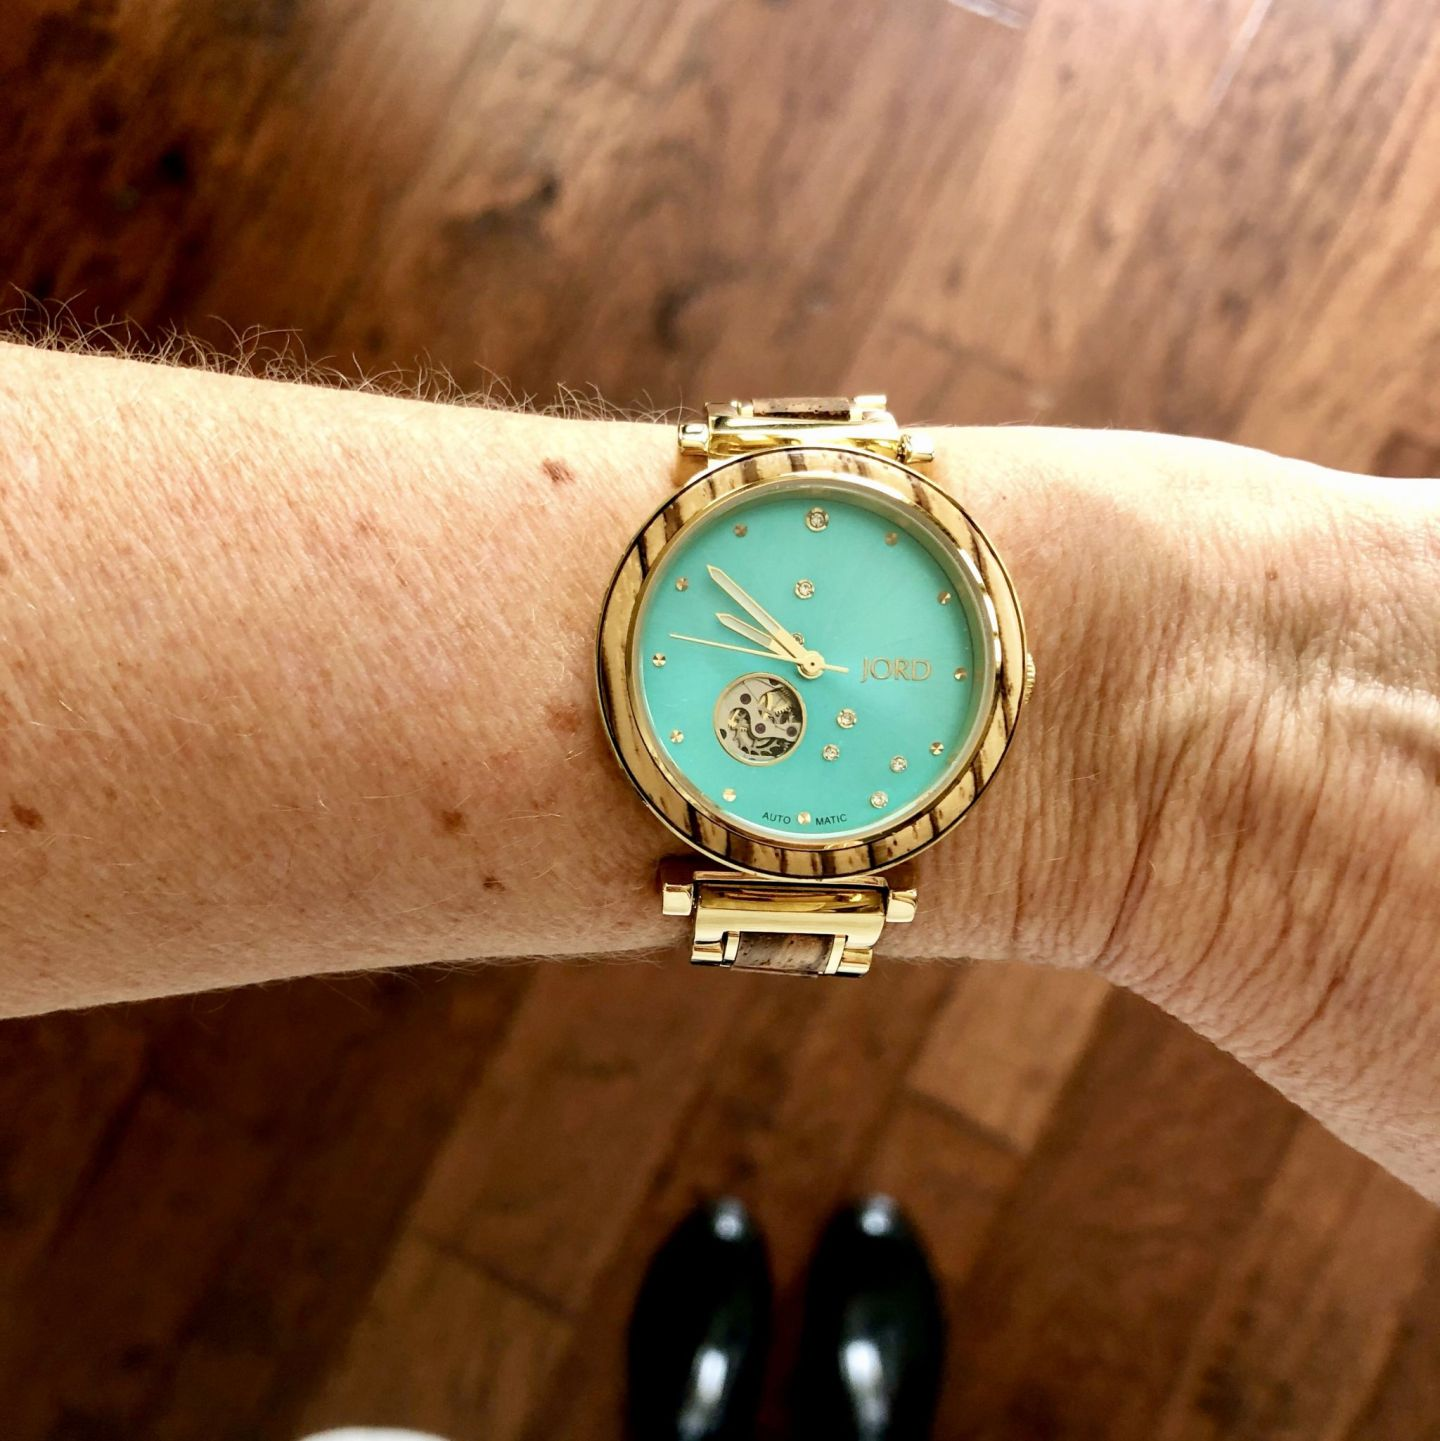 JORD watch giveaway